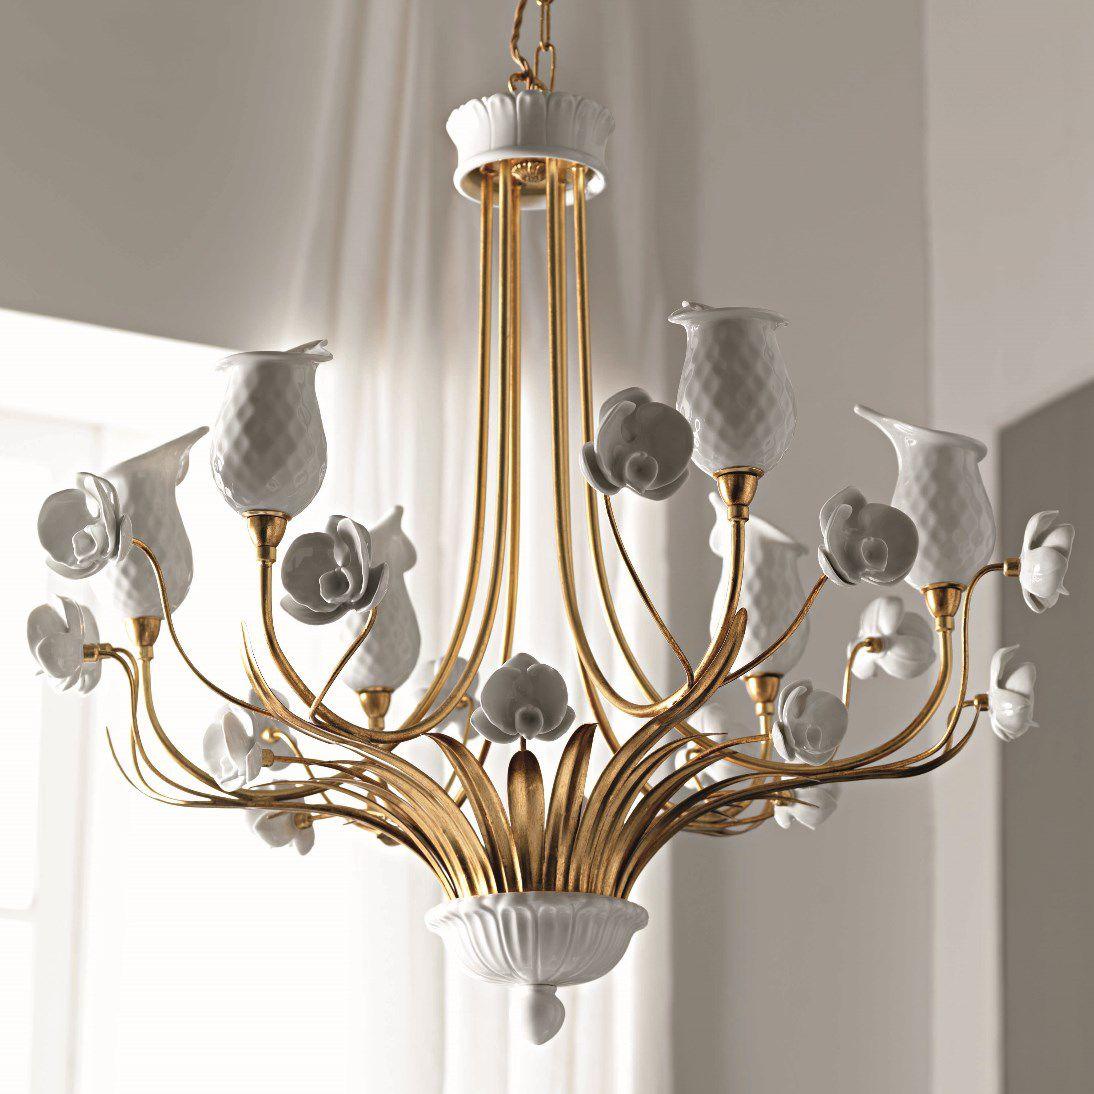 Classic chandelier metal porcelain handmade orchidea le classic chandelier metal porcelain handmade arubaitofo Image collections